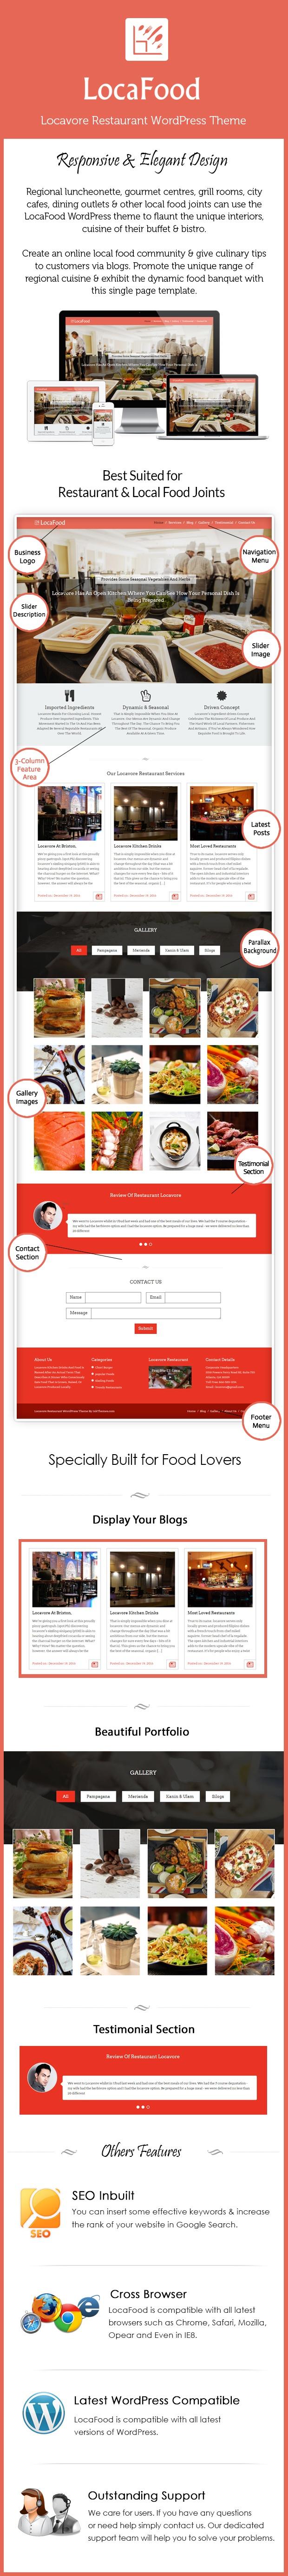 Locavore Restaurant WordPress Theme